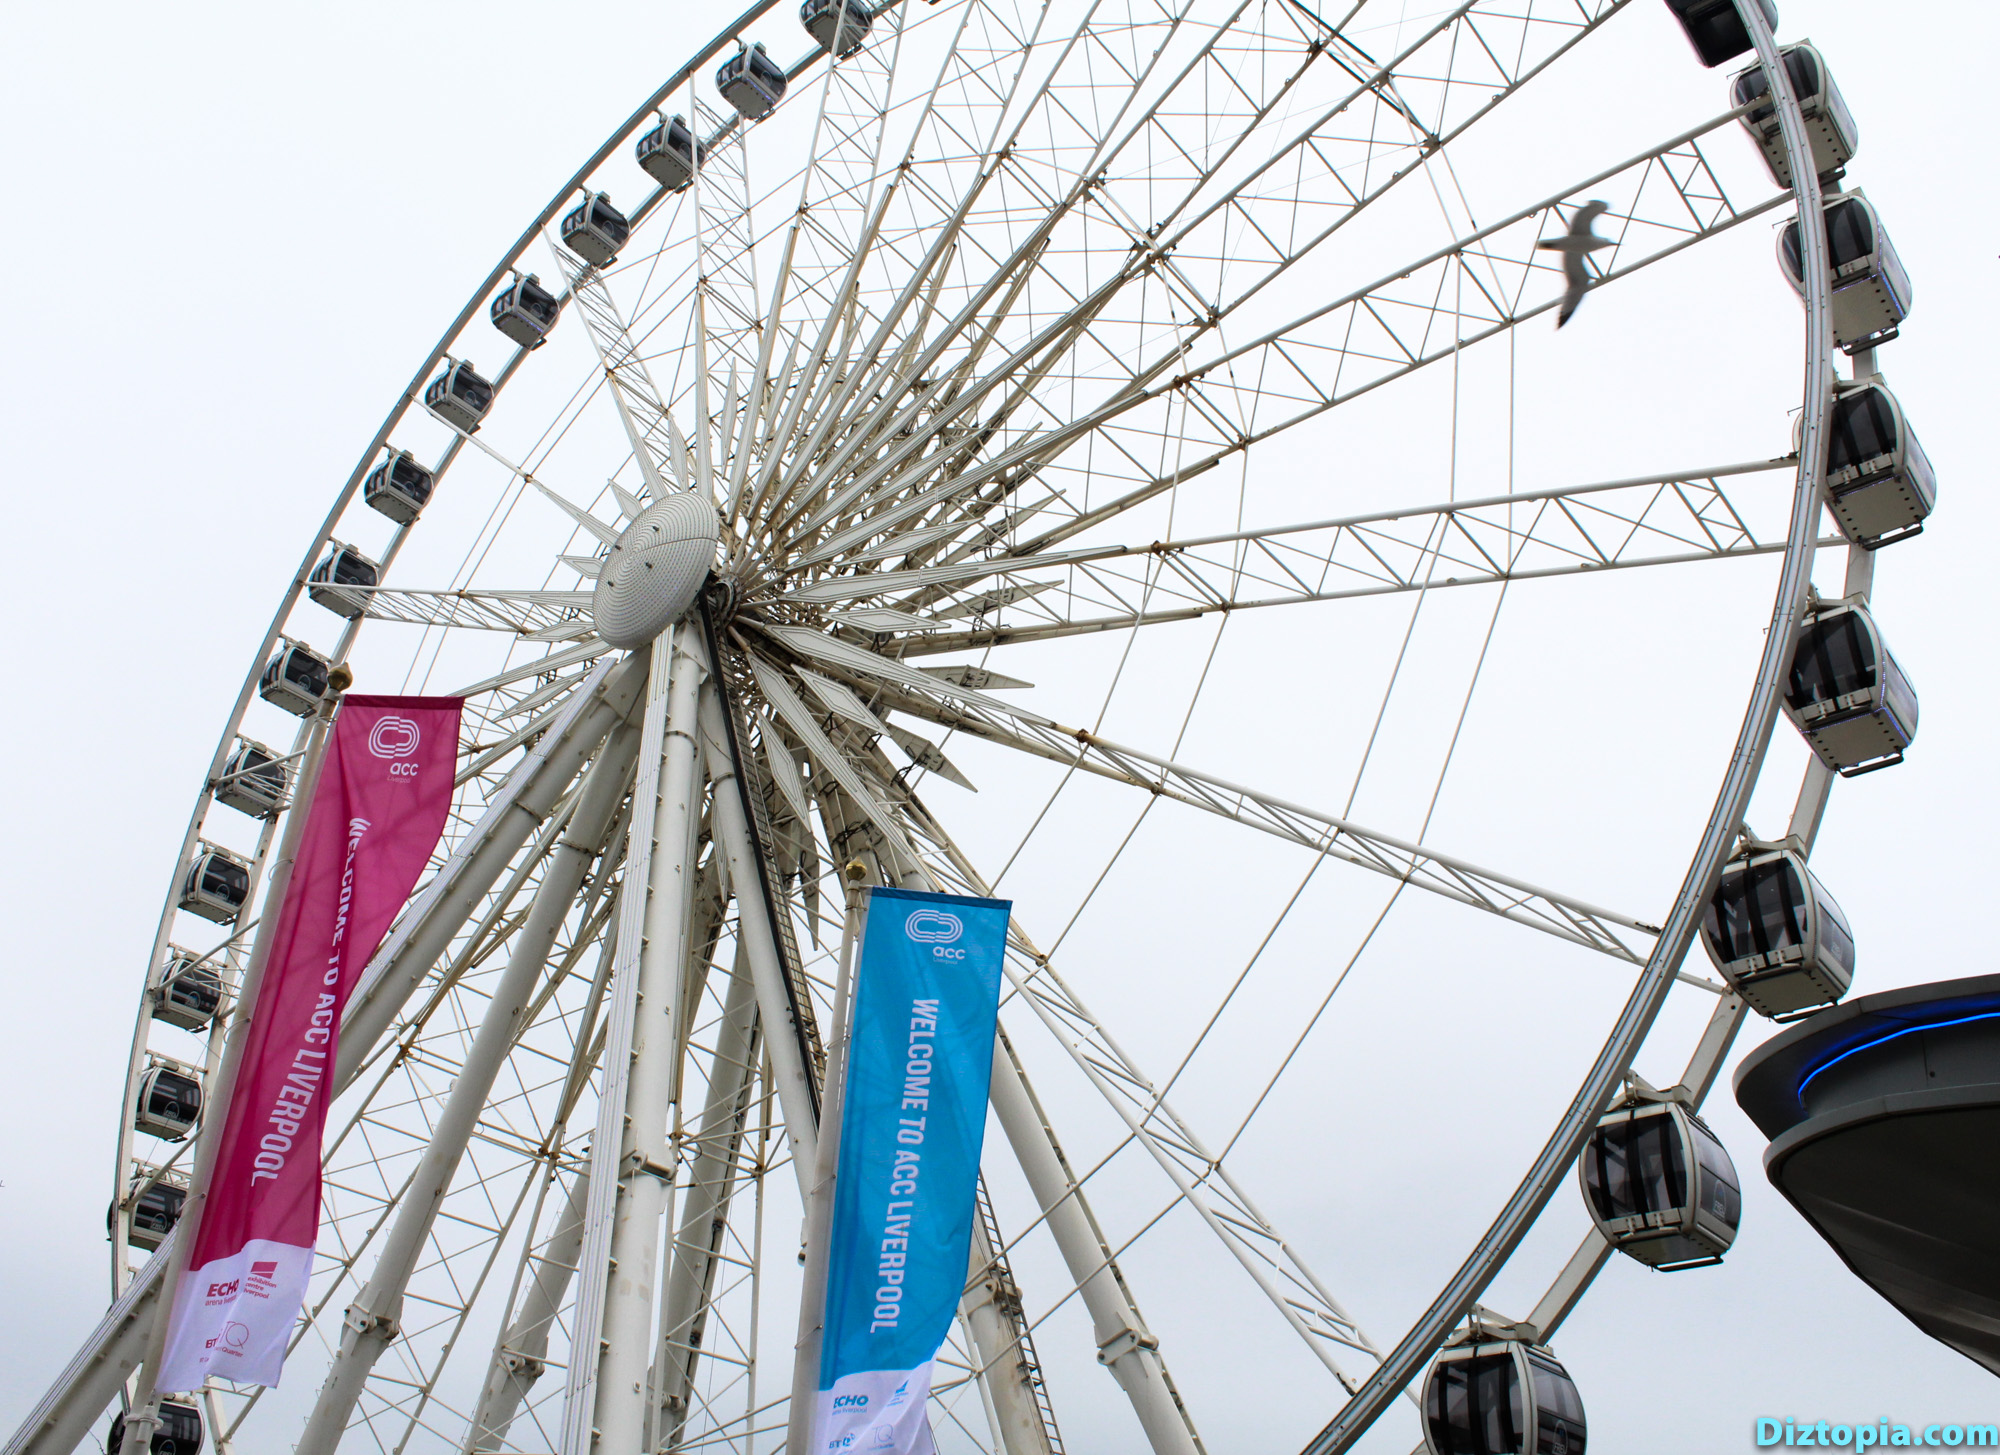 Liverpool-City-UK-Diztopia-Dizma-Dahl-Photography-2017-26-Albert-Dock-Queens-Wapping-Salthouse-Canning-Coburg-Dukes-Ferris-Wheel